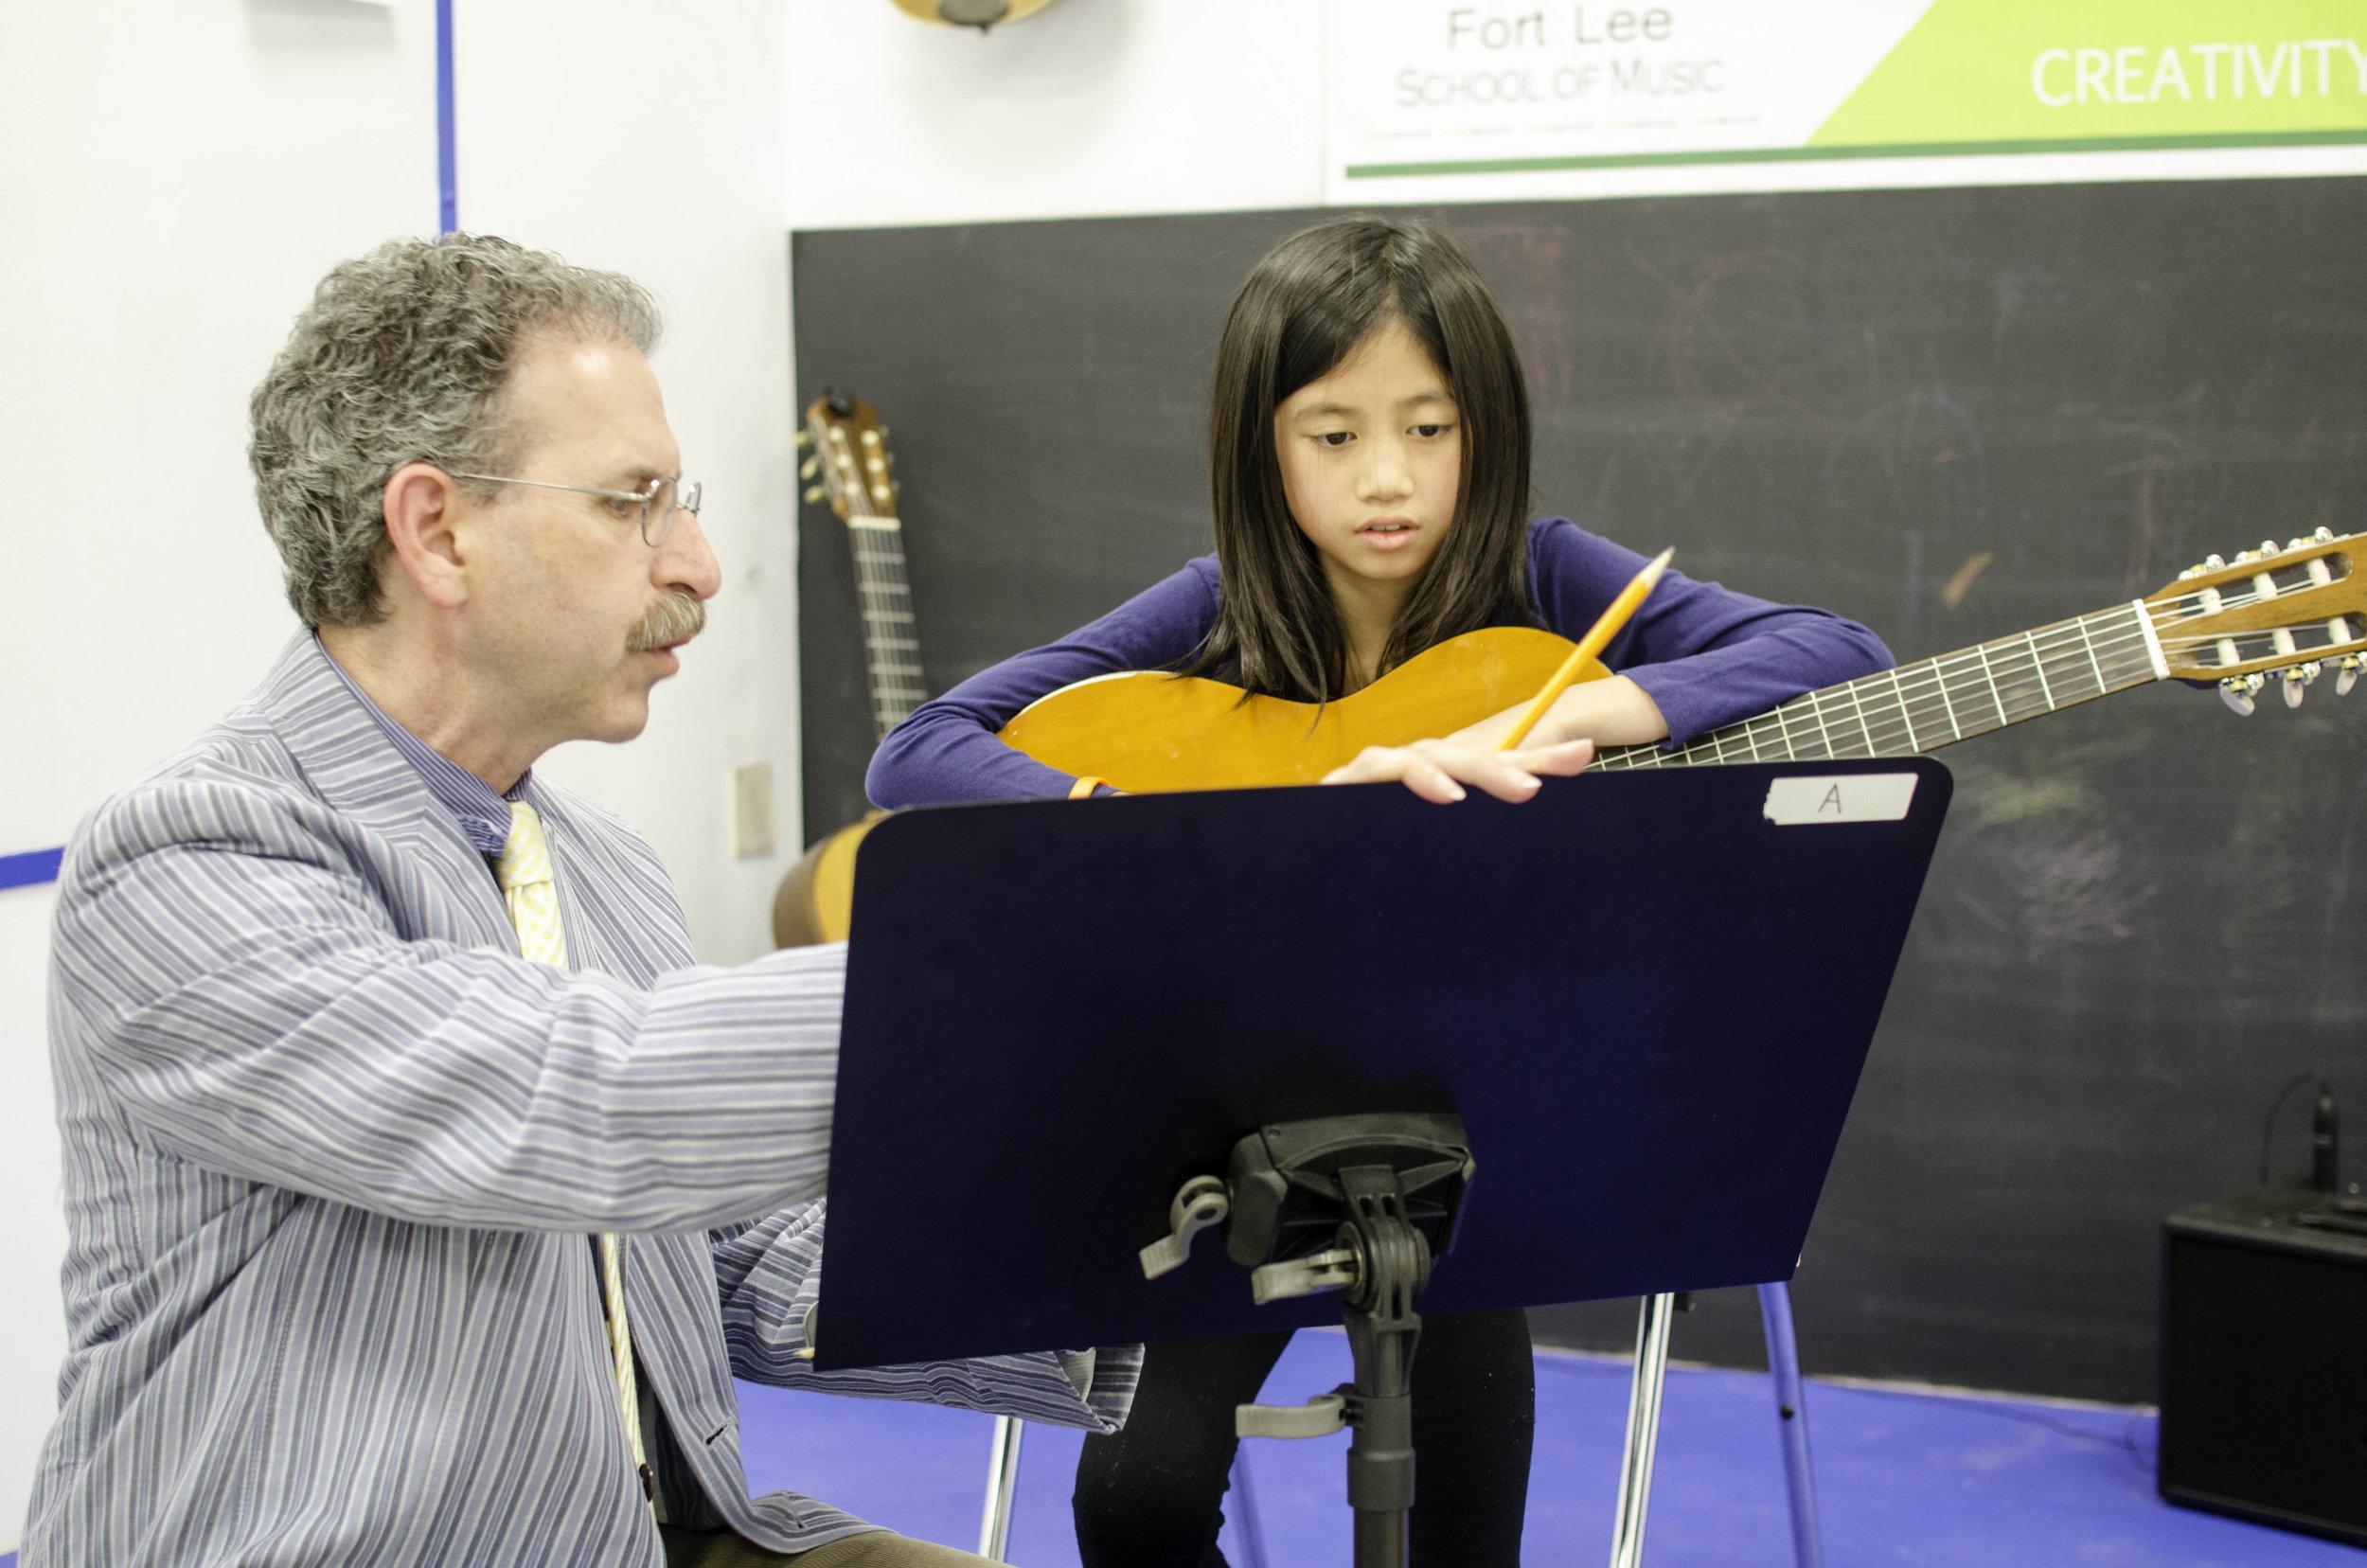 fort_lee_music_kids_class_victoria_image.jpg